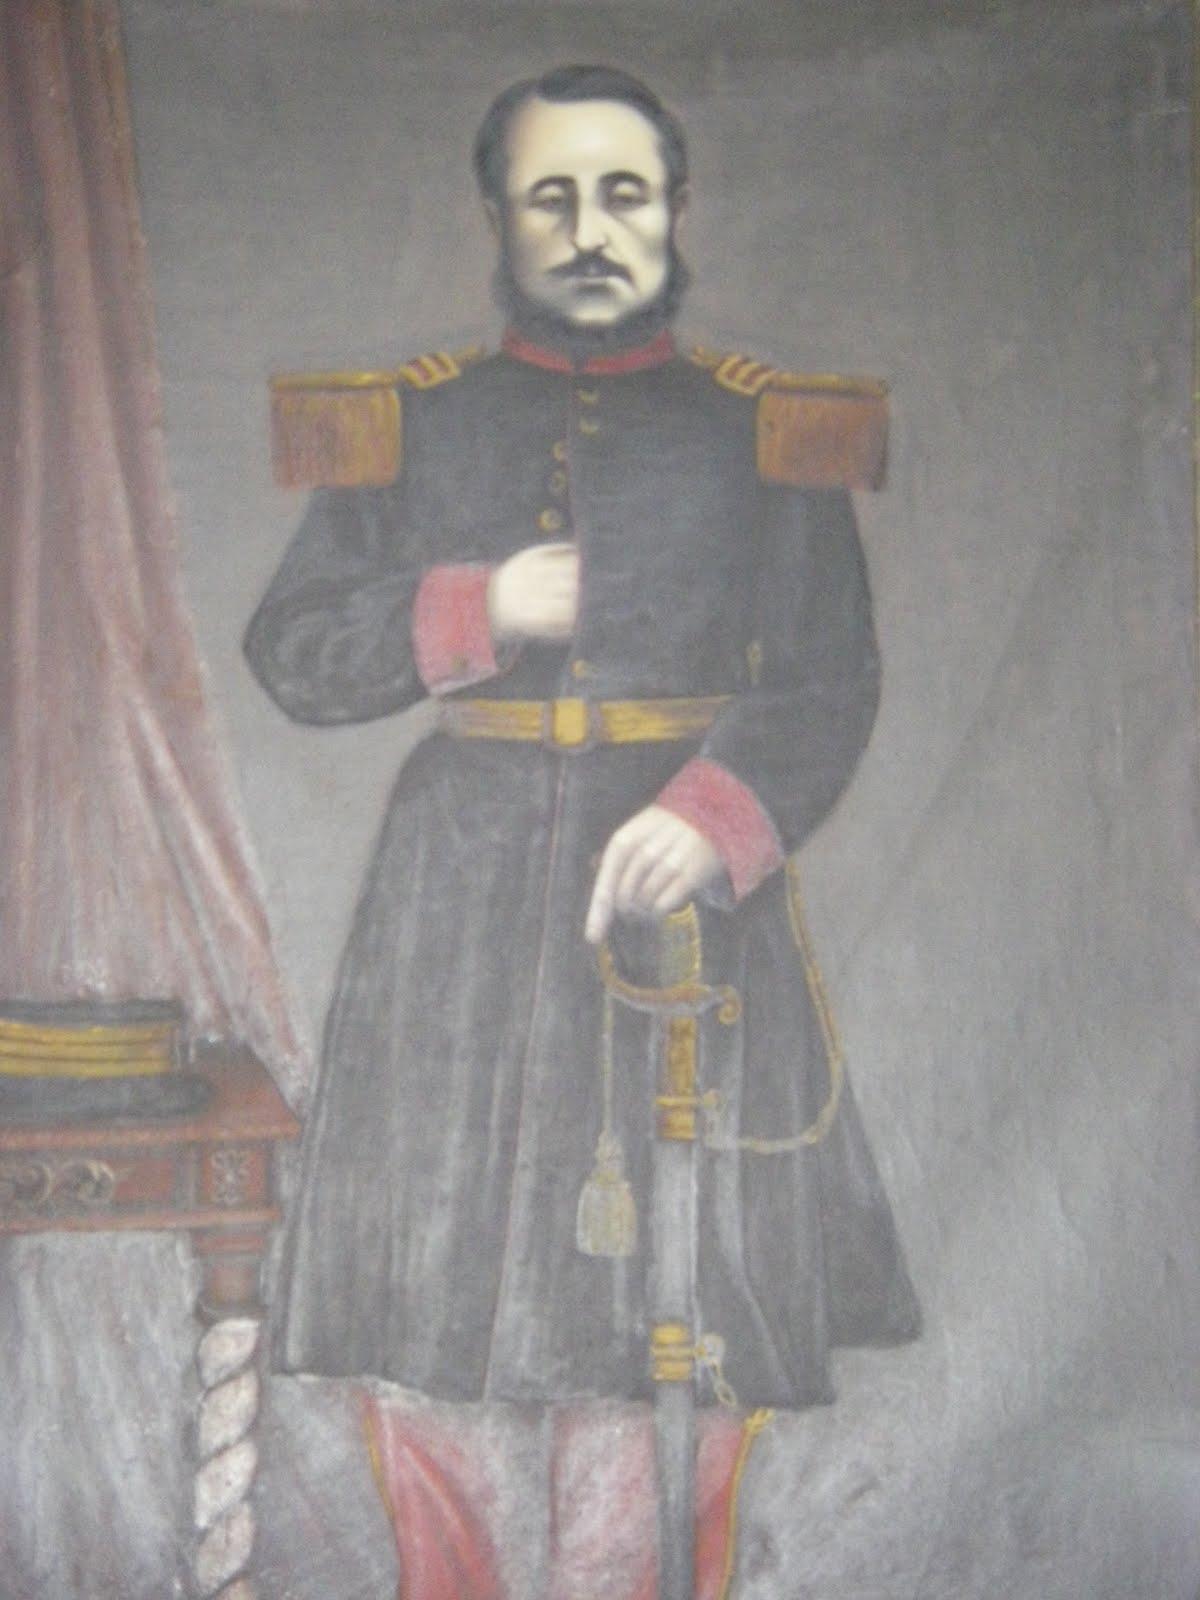 Coronel Simon Tadeo Vizcarra (1821-1907)